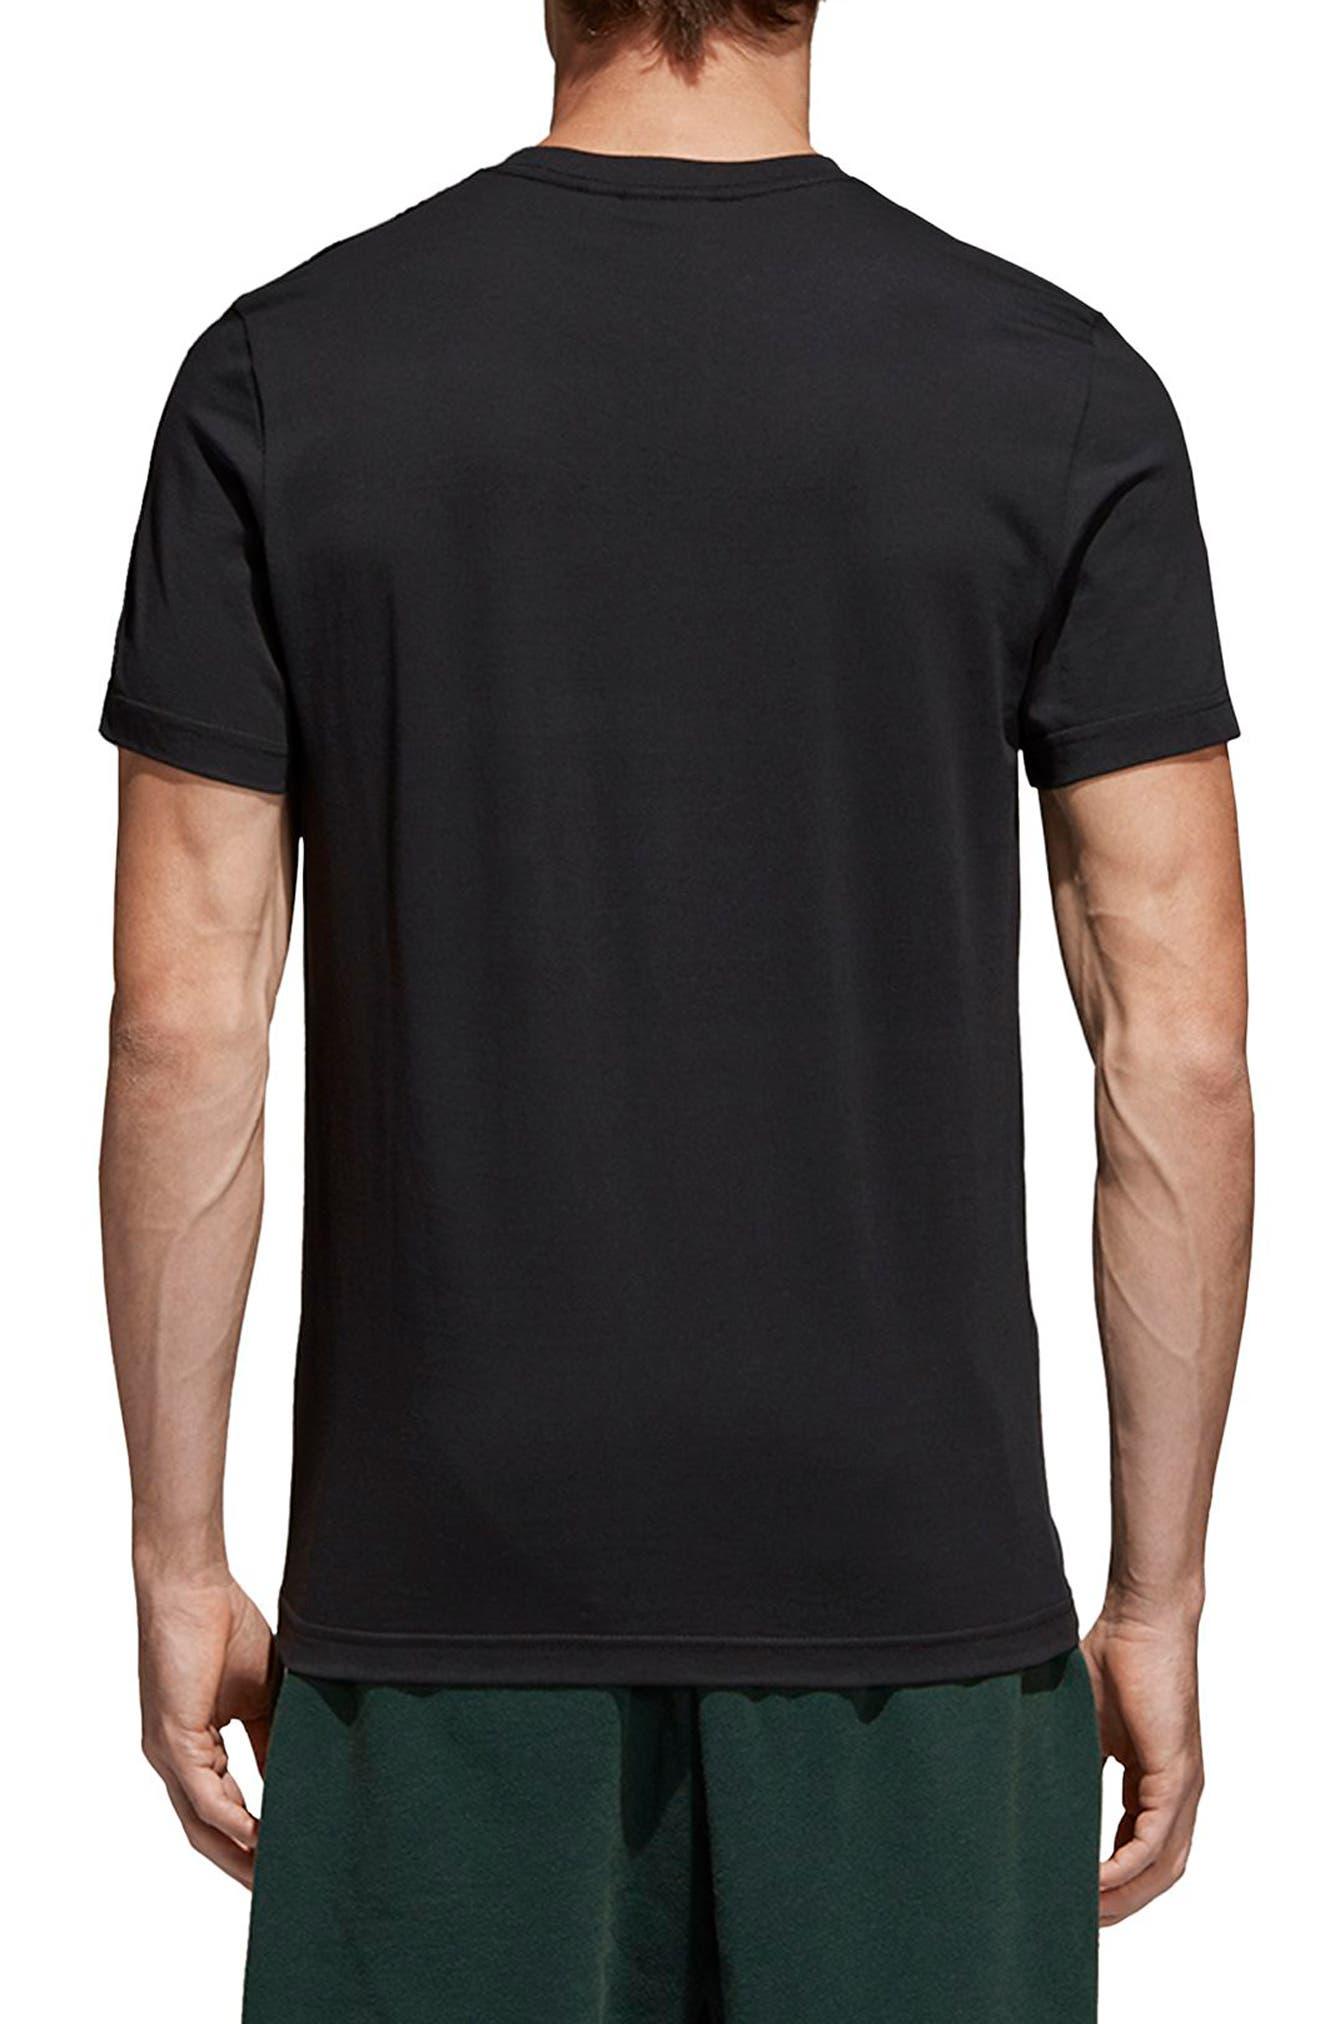 Traction Trefoil Graphic T-Shirt,                             Alternate thumbnail 2, color,                             Black